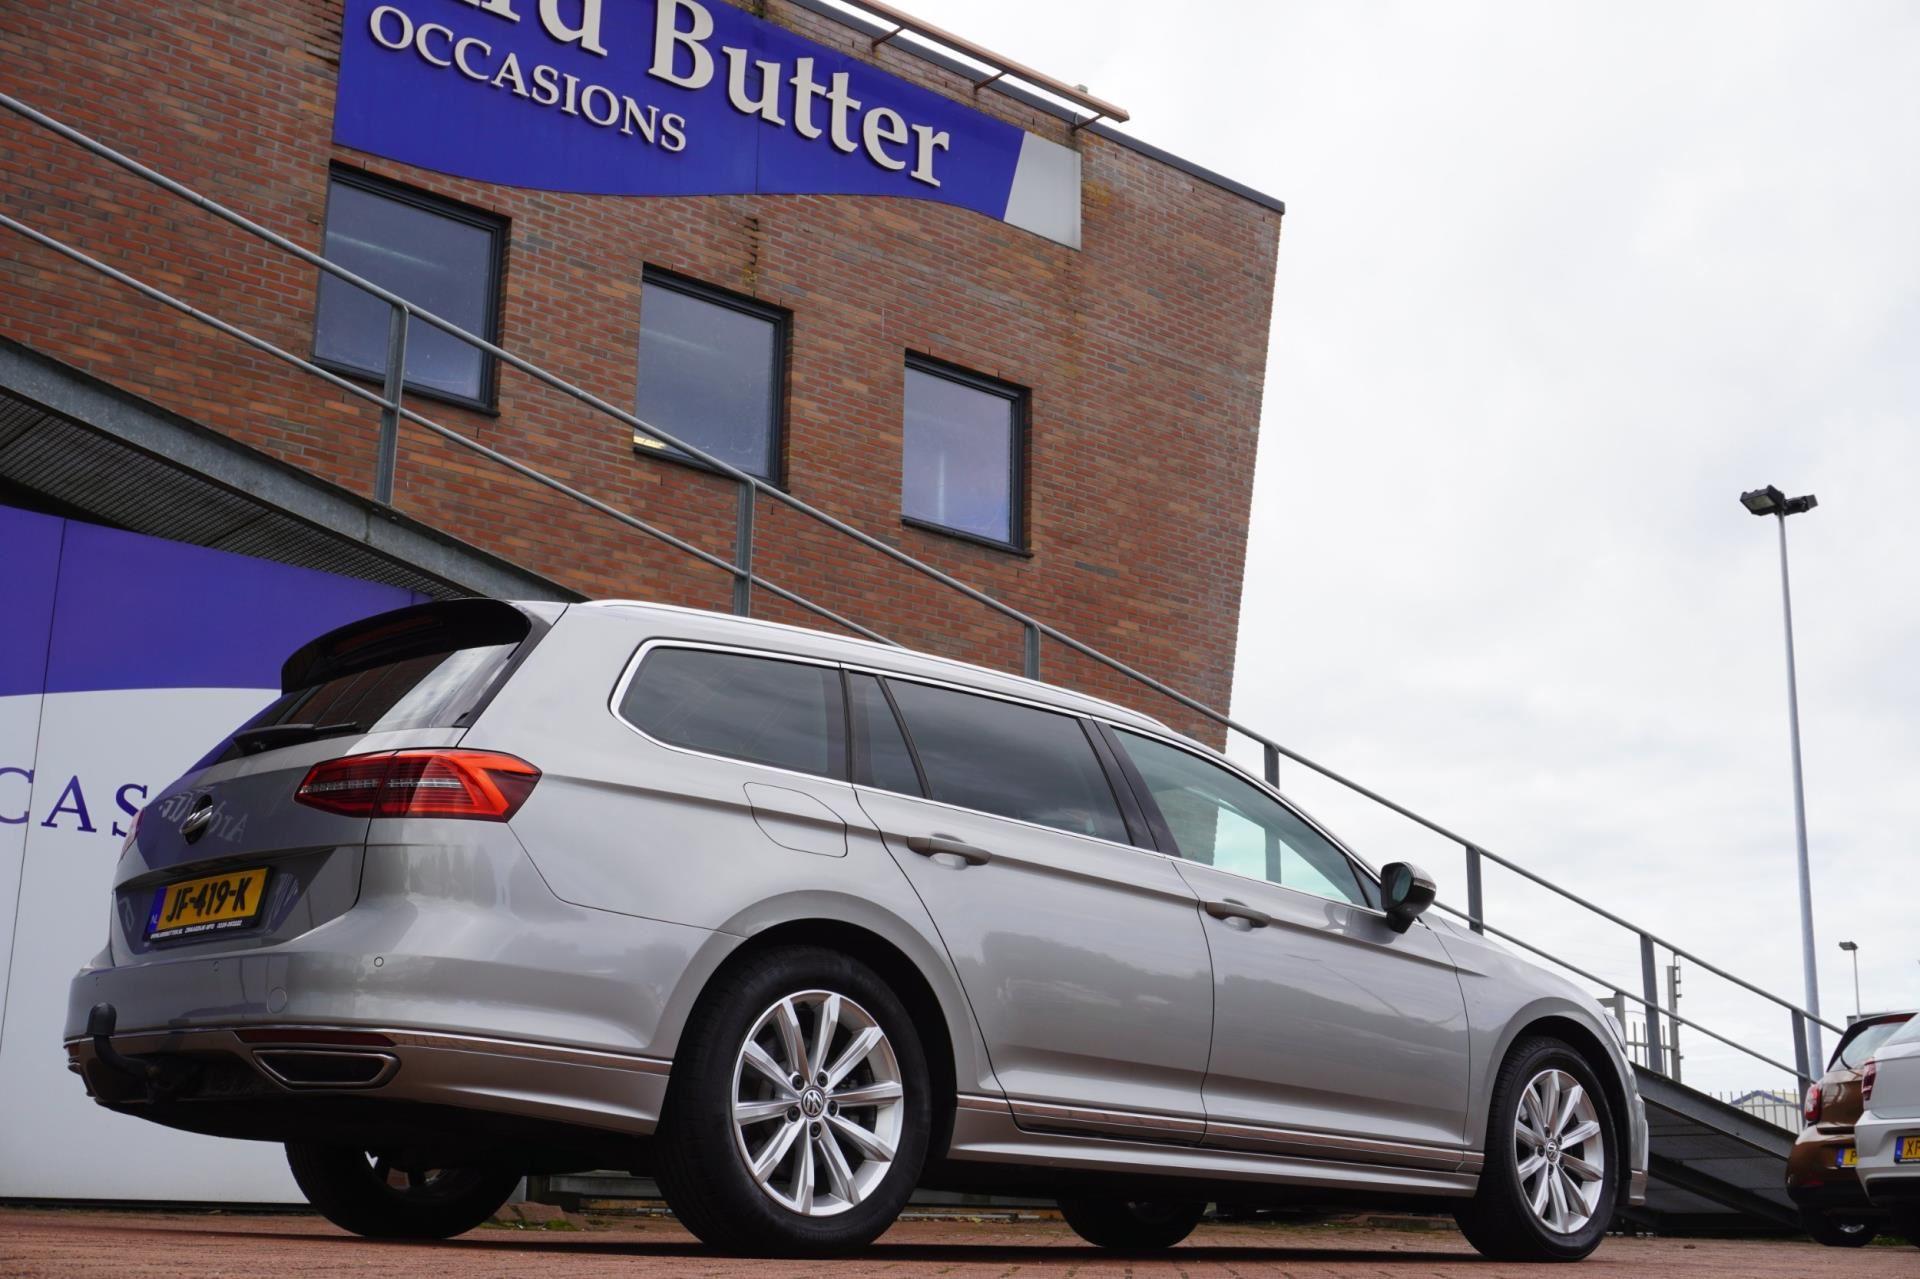 Volkswagen Passat Variant occasion - Autobedrijf Ard Butter B.V.